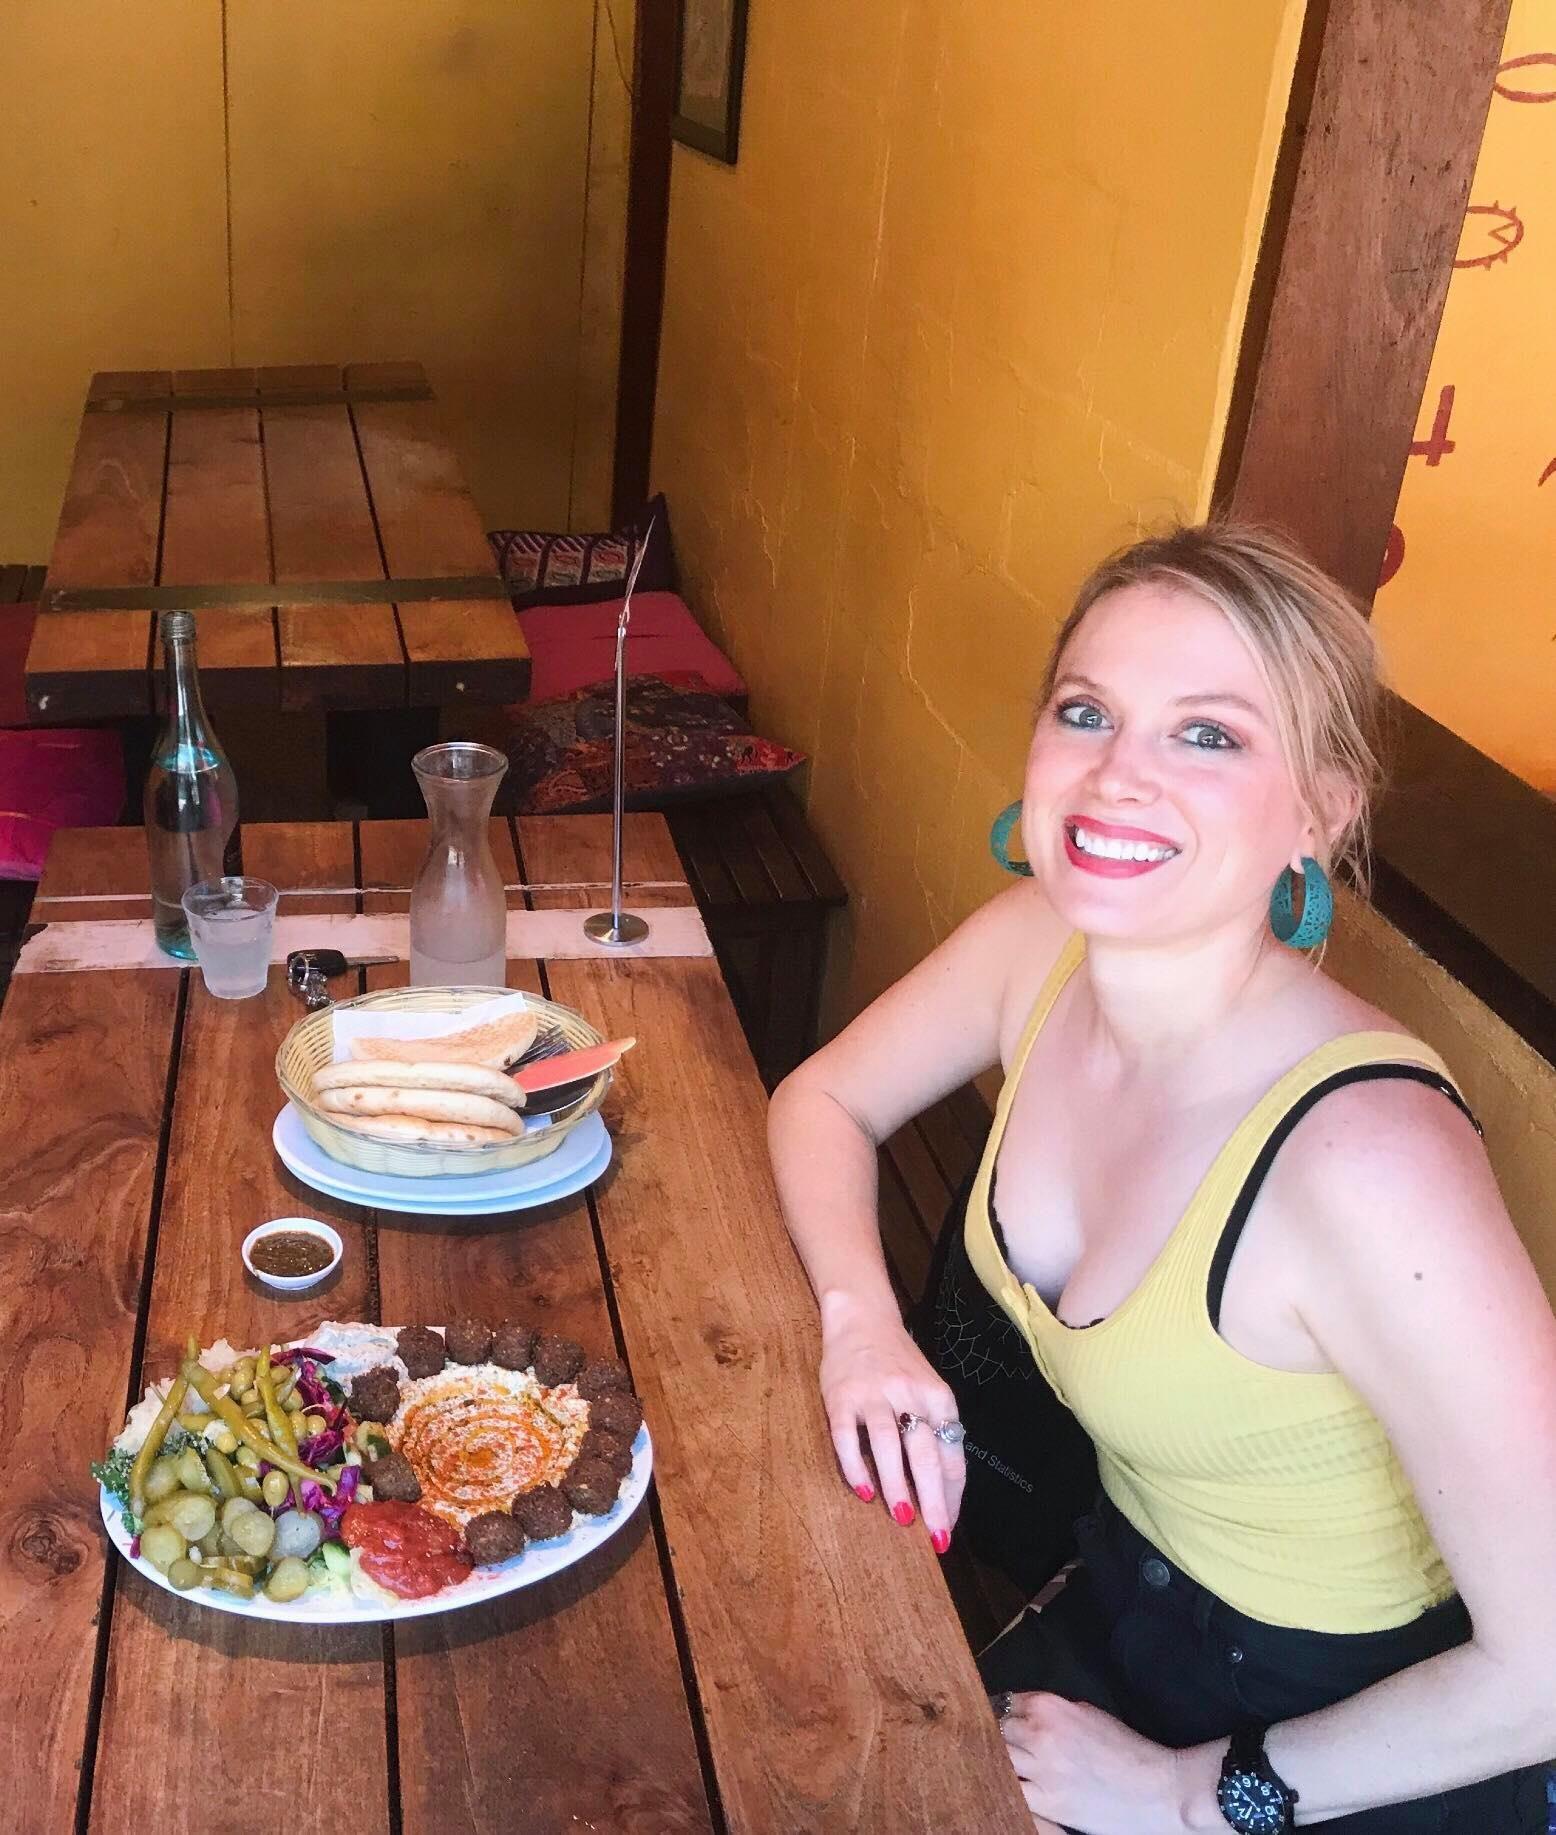 A Vegan Chat With Susannah Waters of V3gan Food